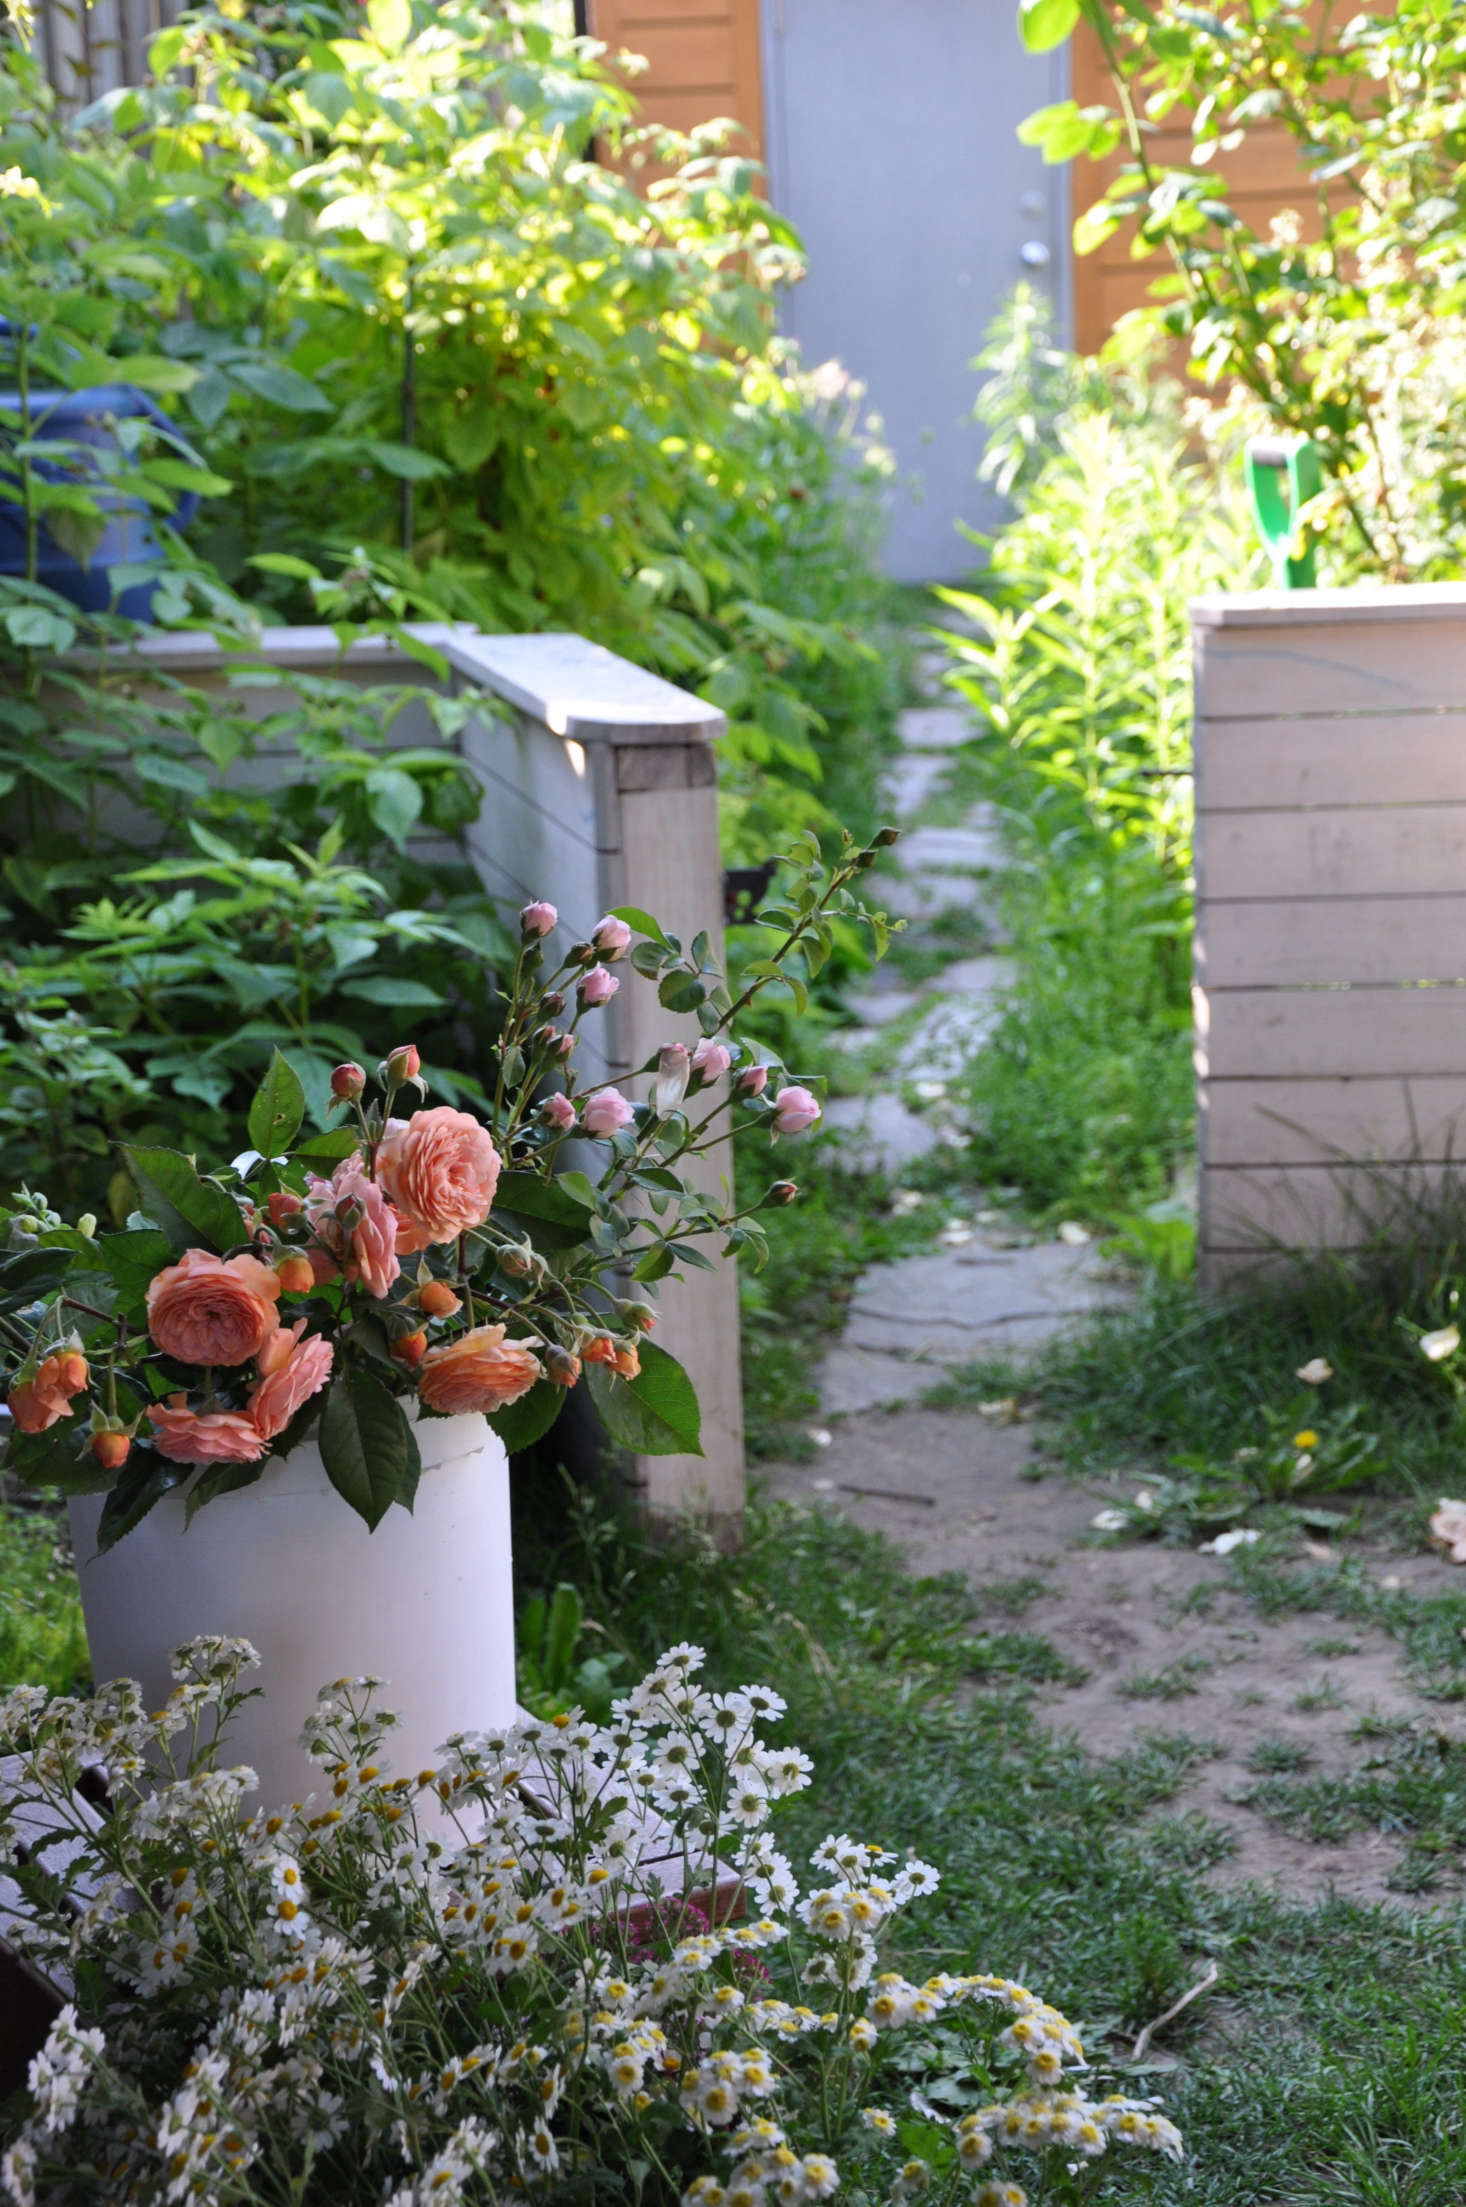 Sarah Nixonu0027s Business, My Luscious Backyard, Relies On Urban Gardens In  The Neighborhood To